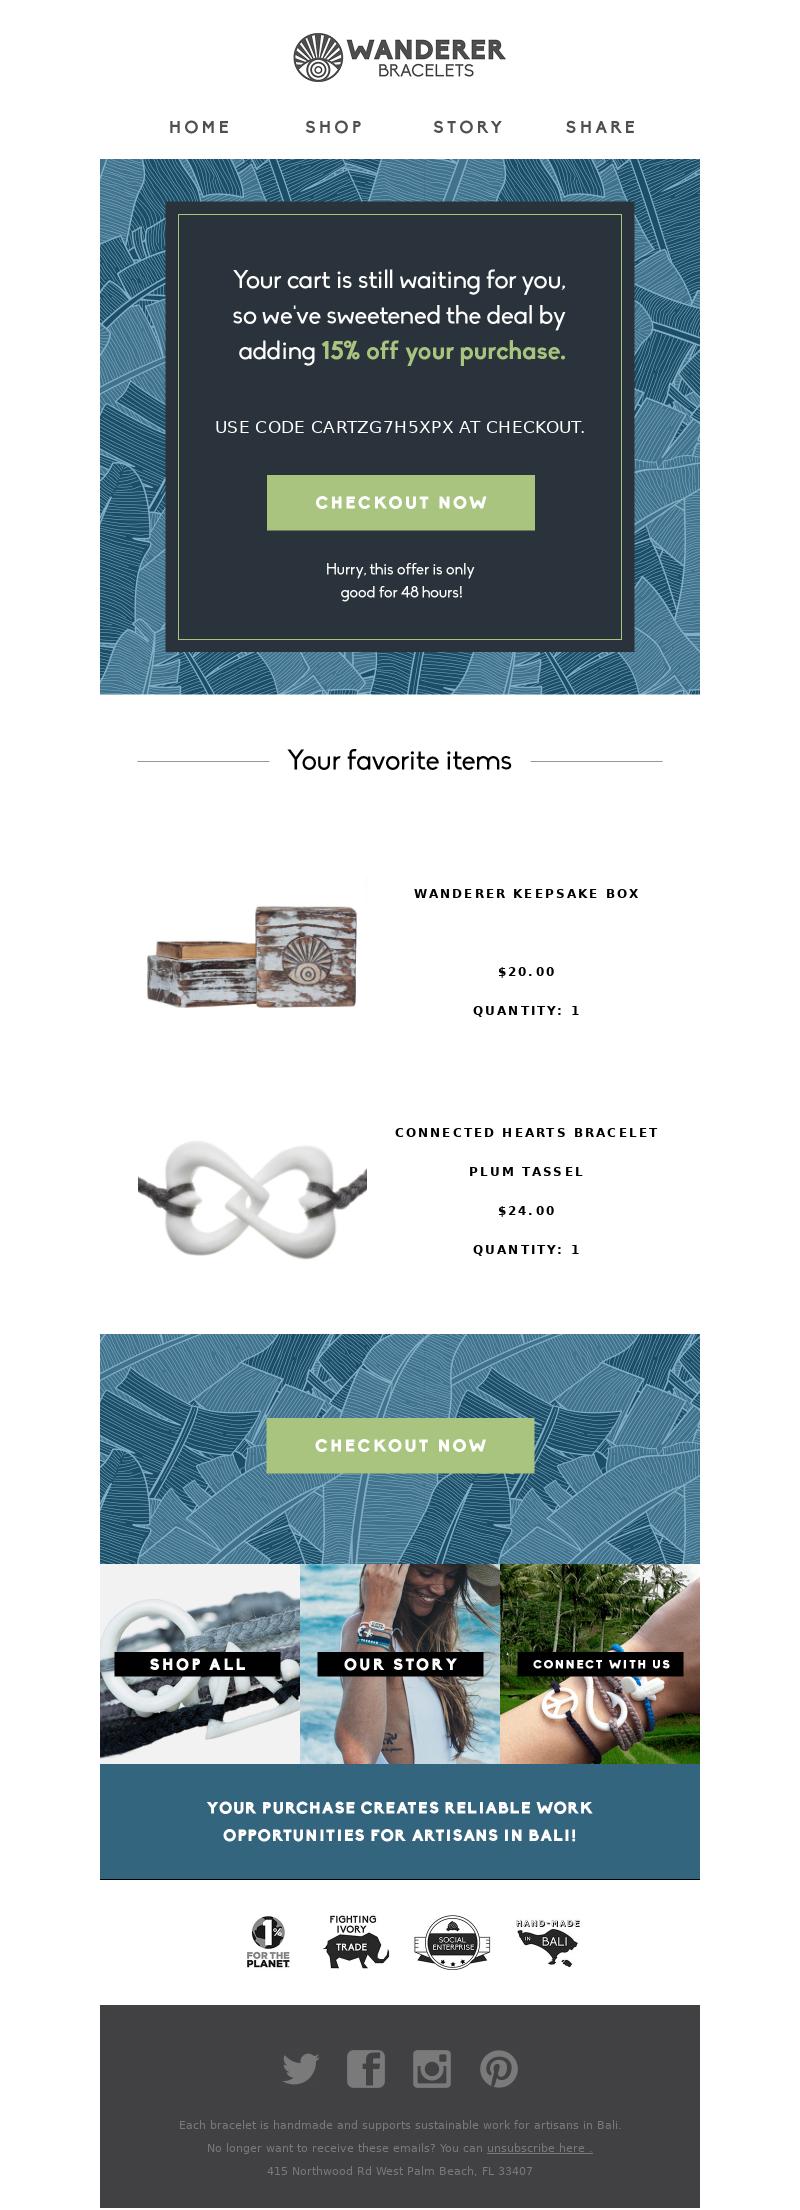 Wanderer Bracelets - Still interested? How about 15% off?